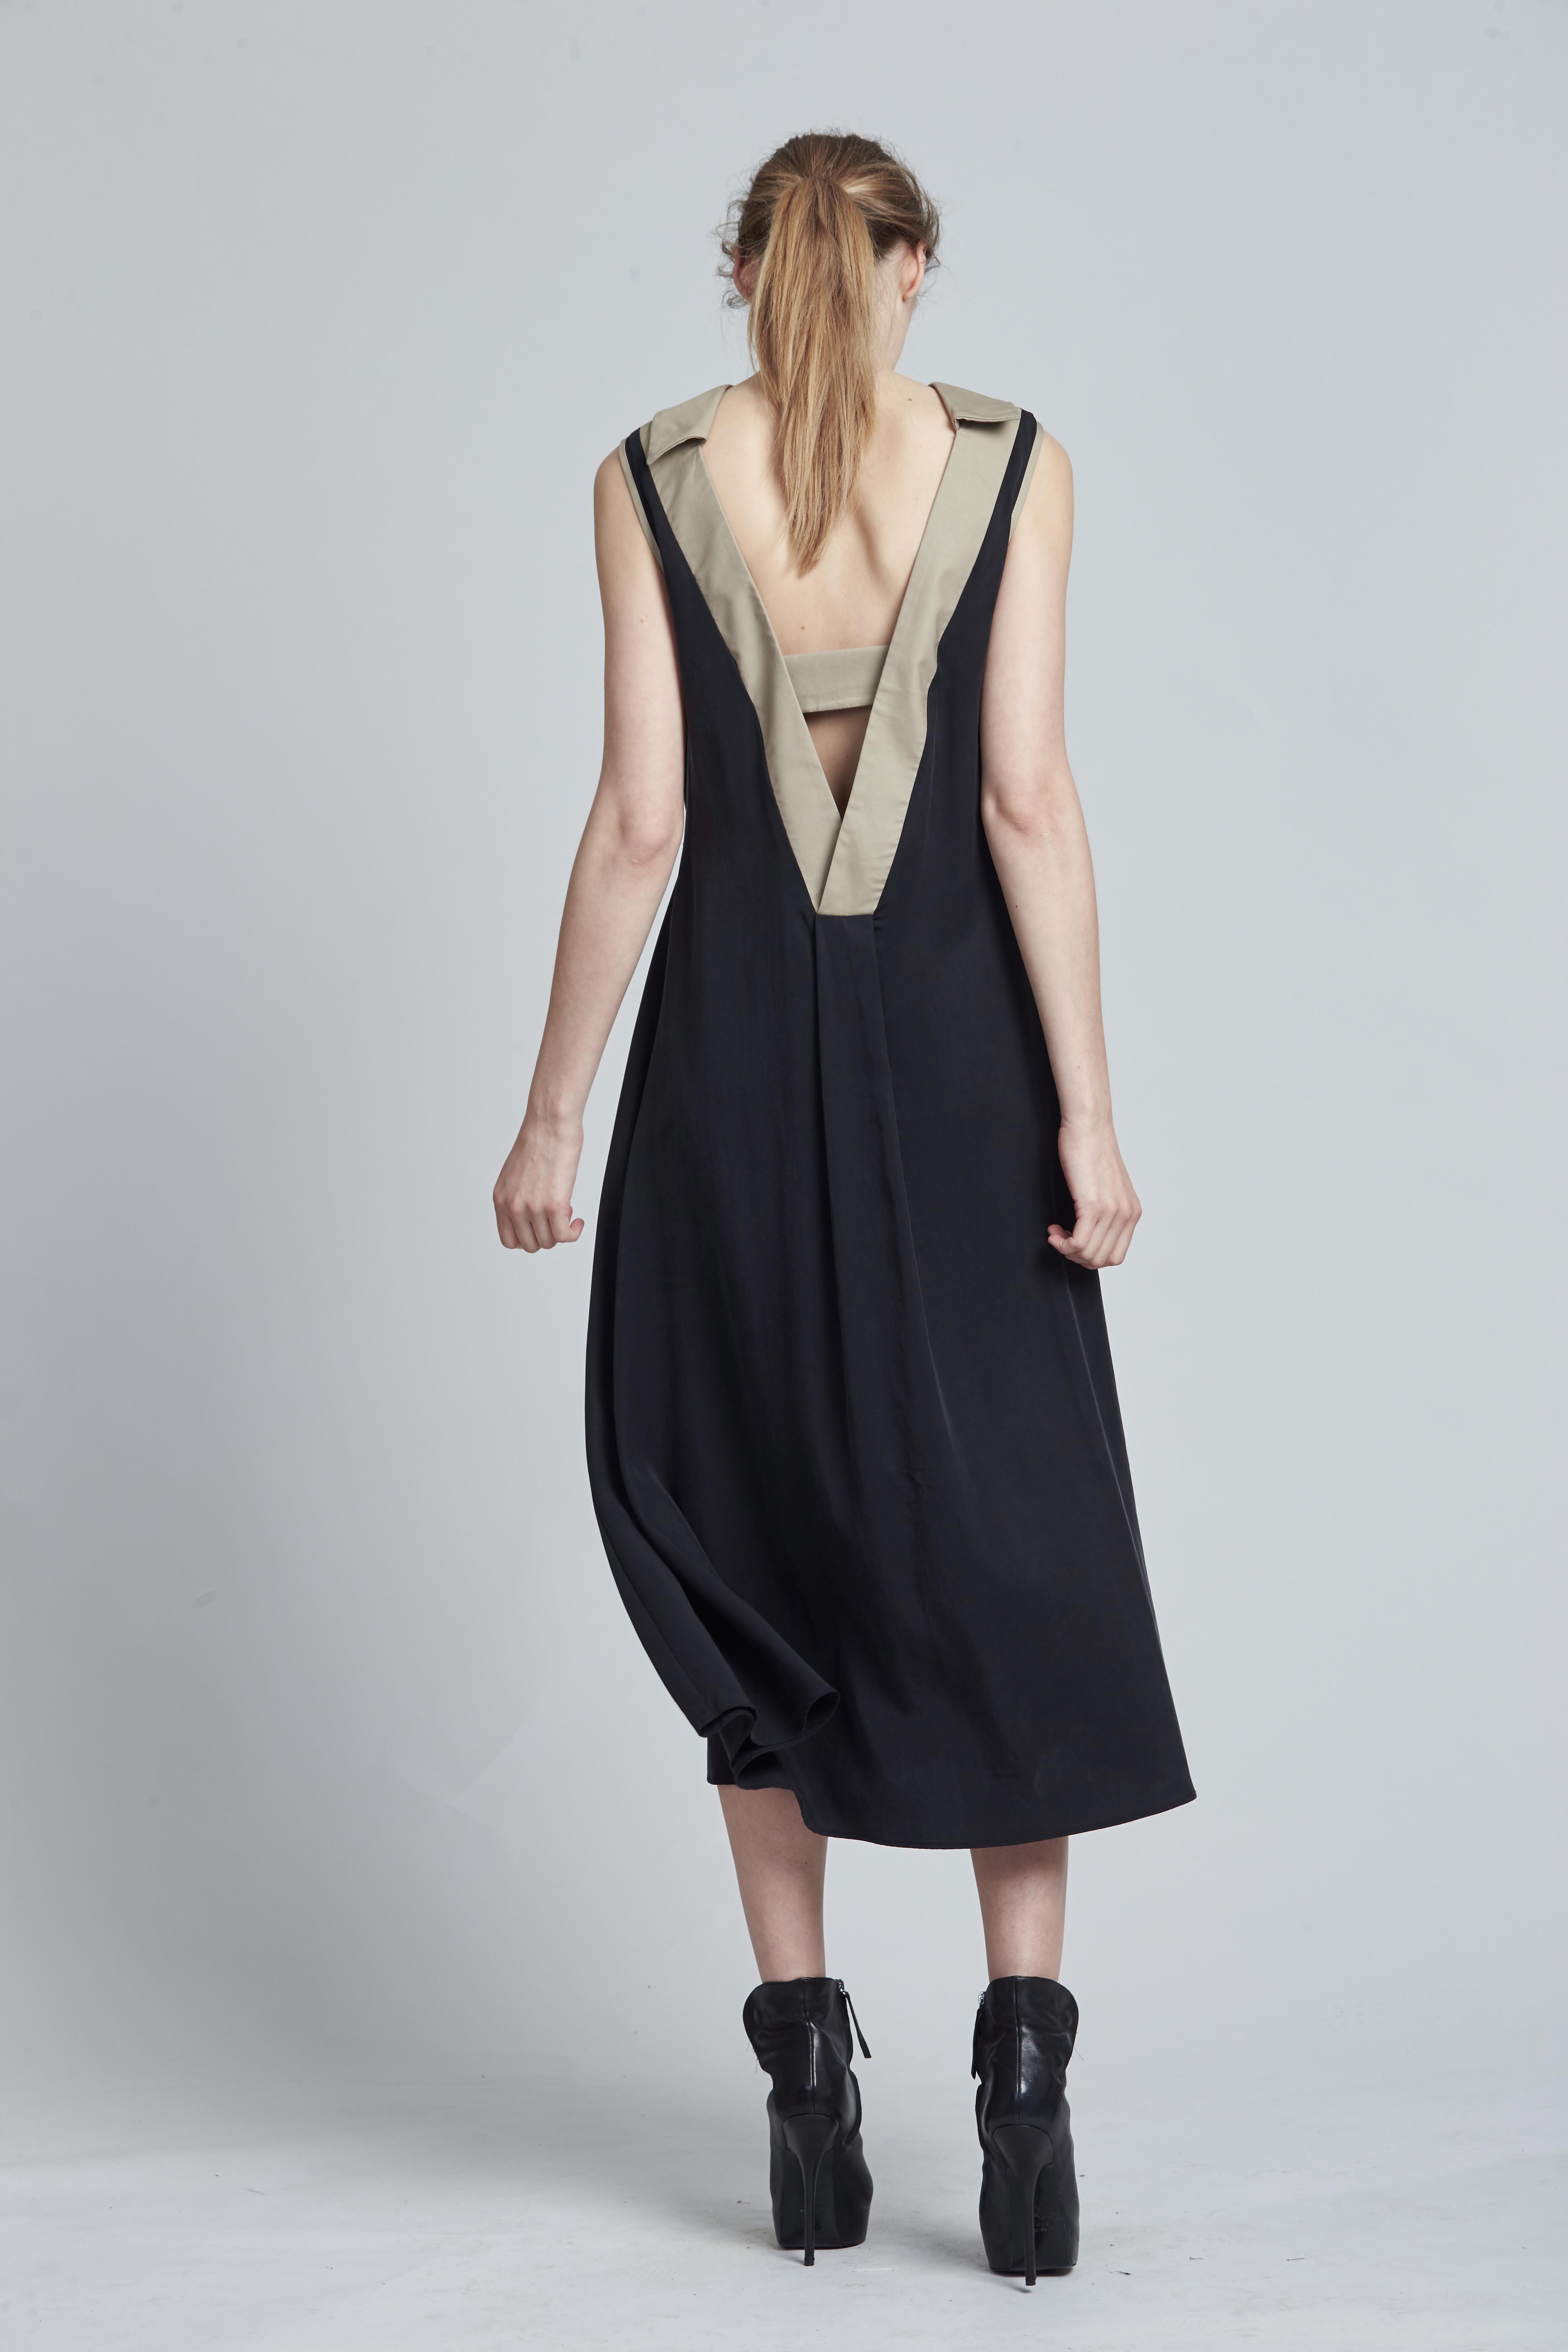 Acute Dress Black 20 taylorS15-1267